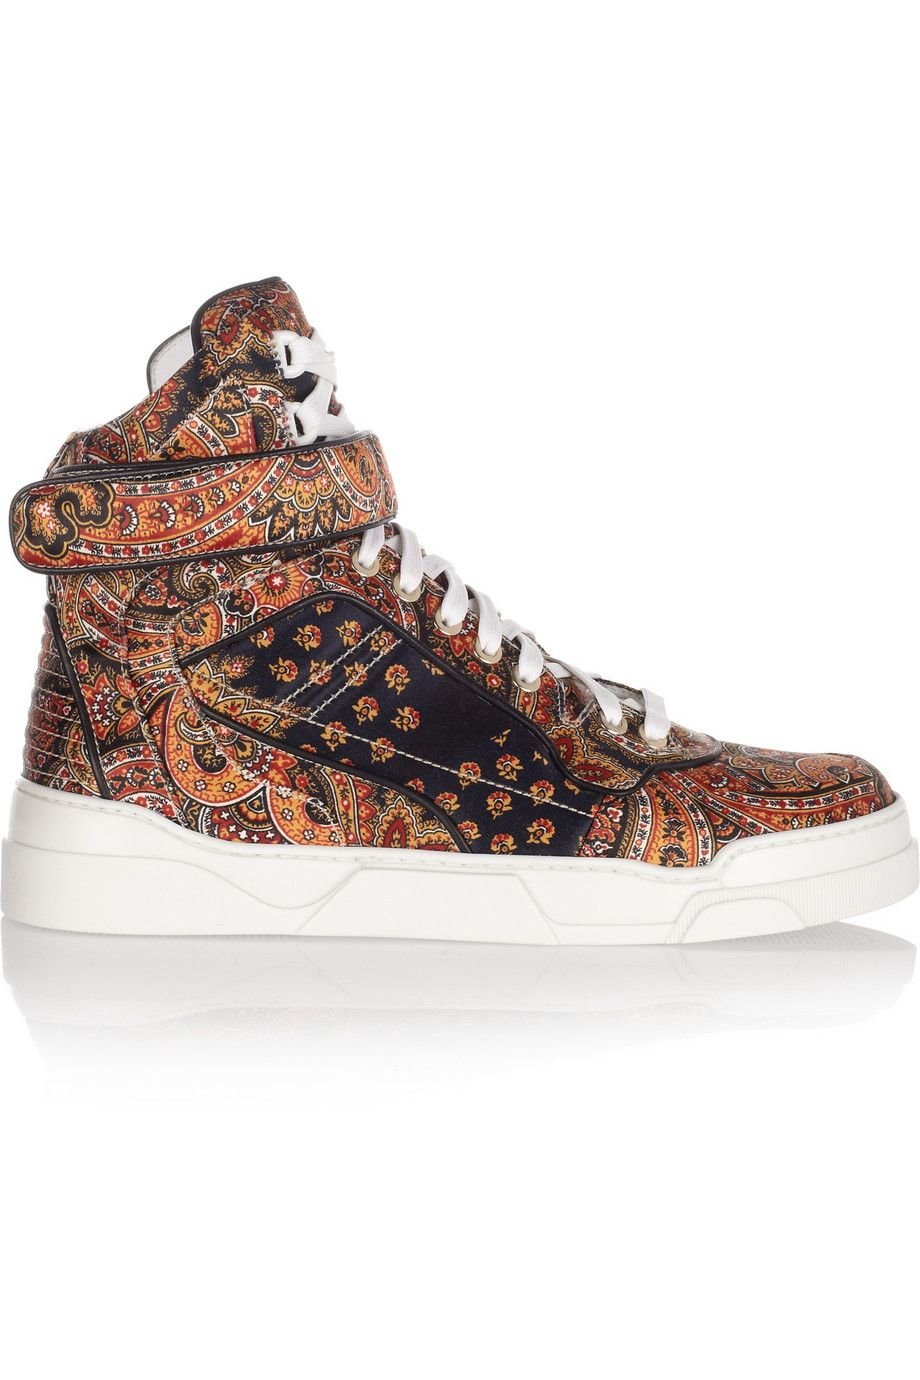 the best attitude b2926 cb0d8 Givenchy Batik Sneakers as seen on Jourdan Dunn